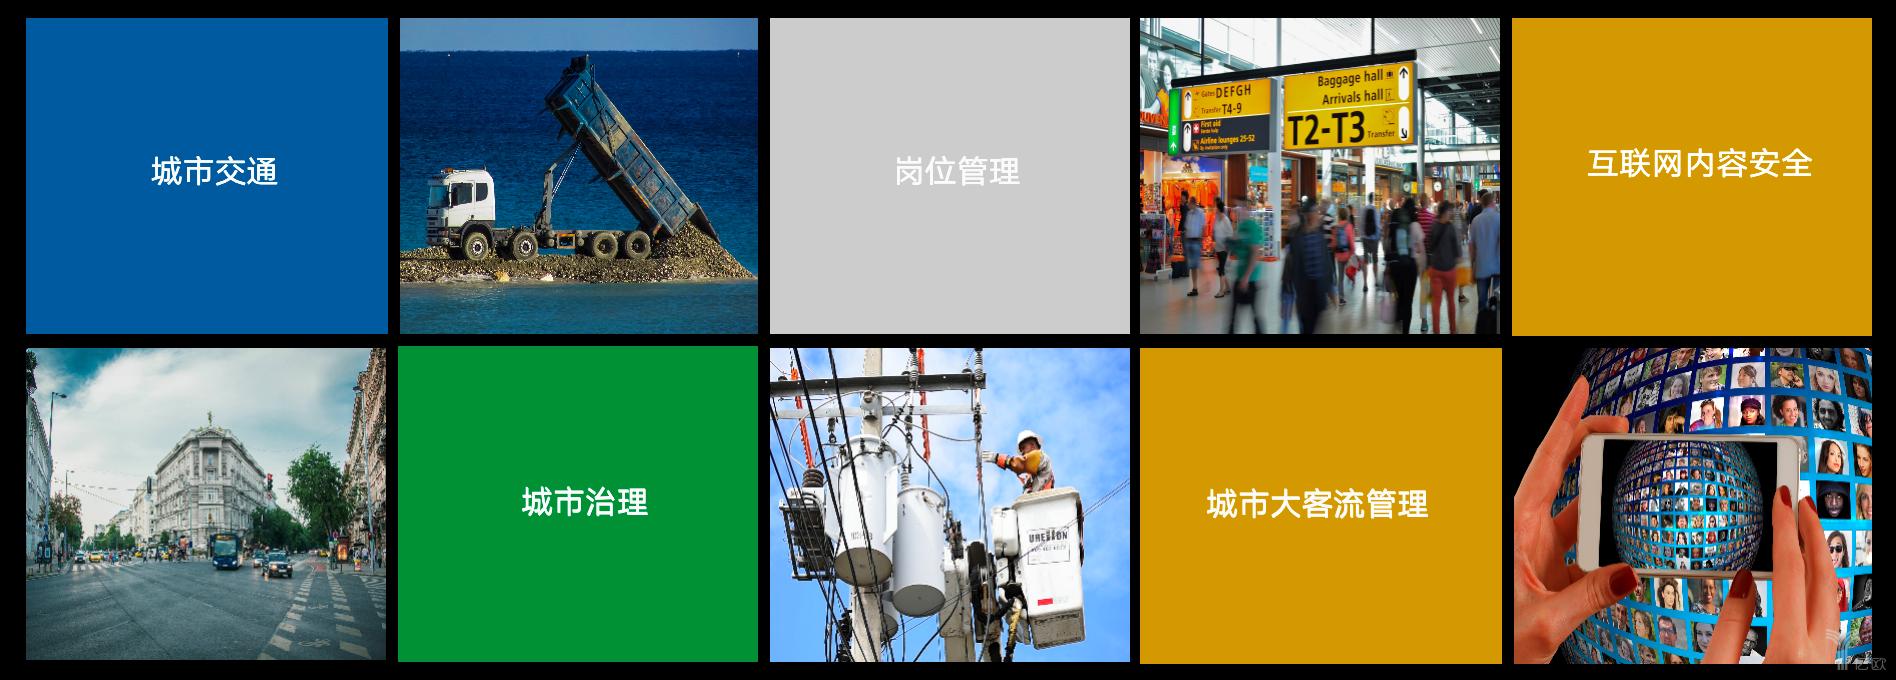 VisionMind平台的产品已在五大领域落地应用